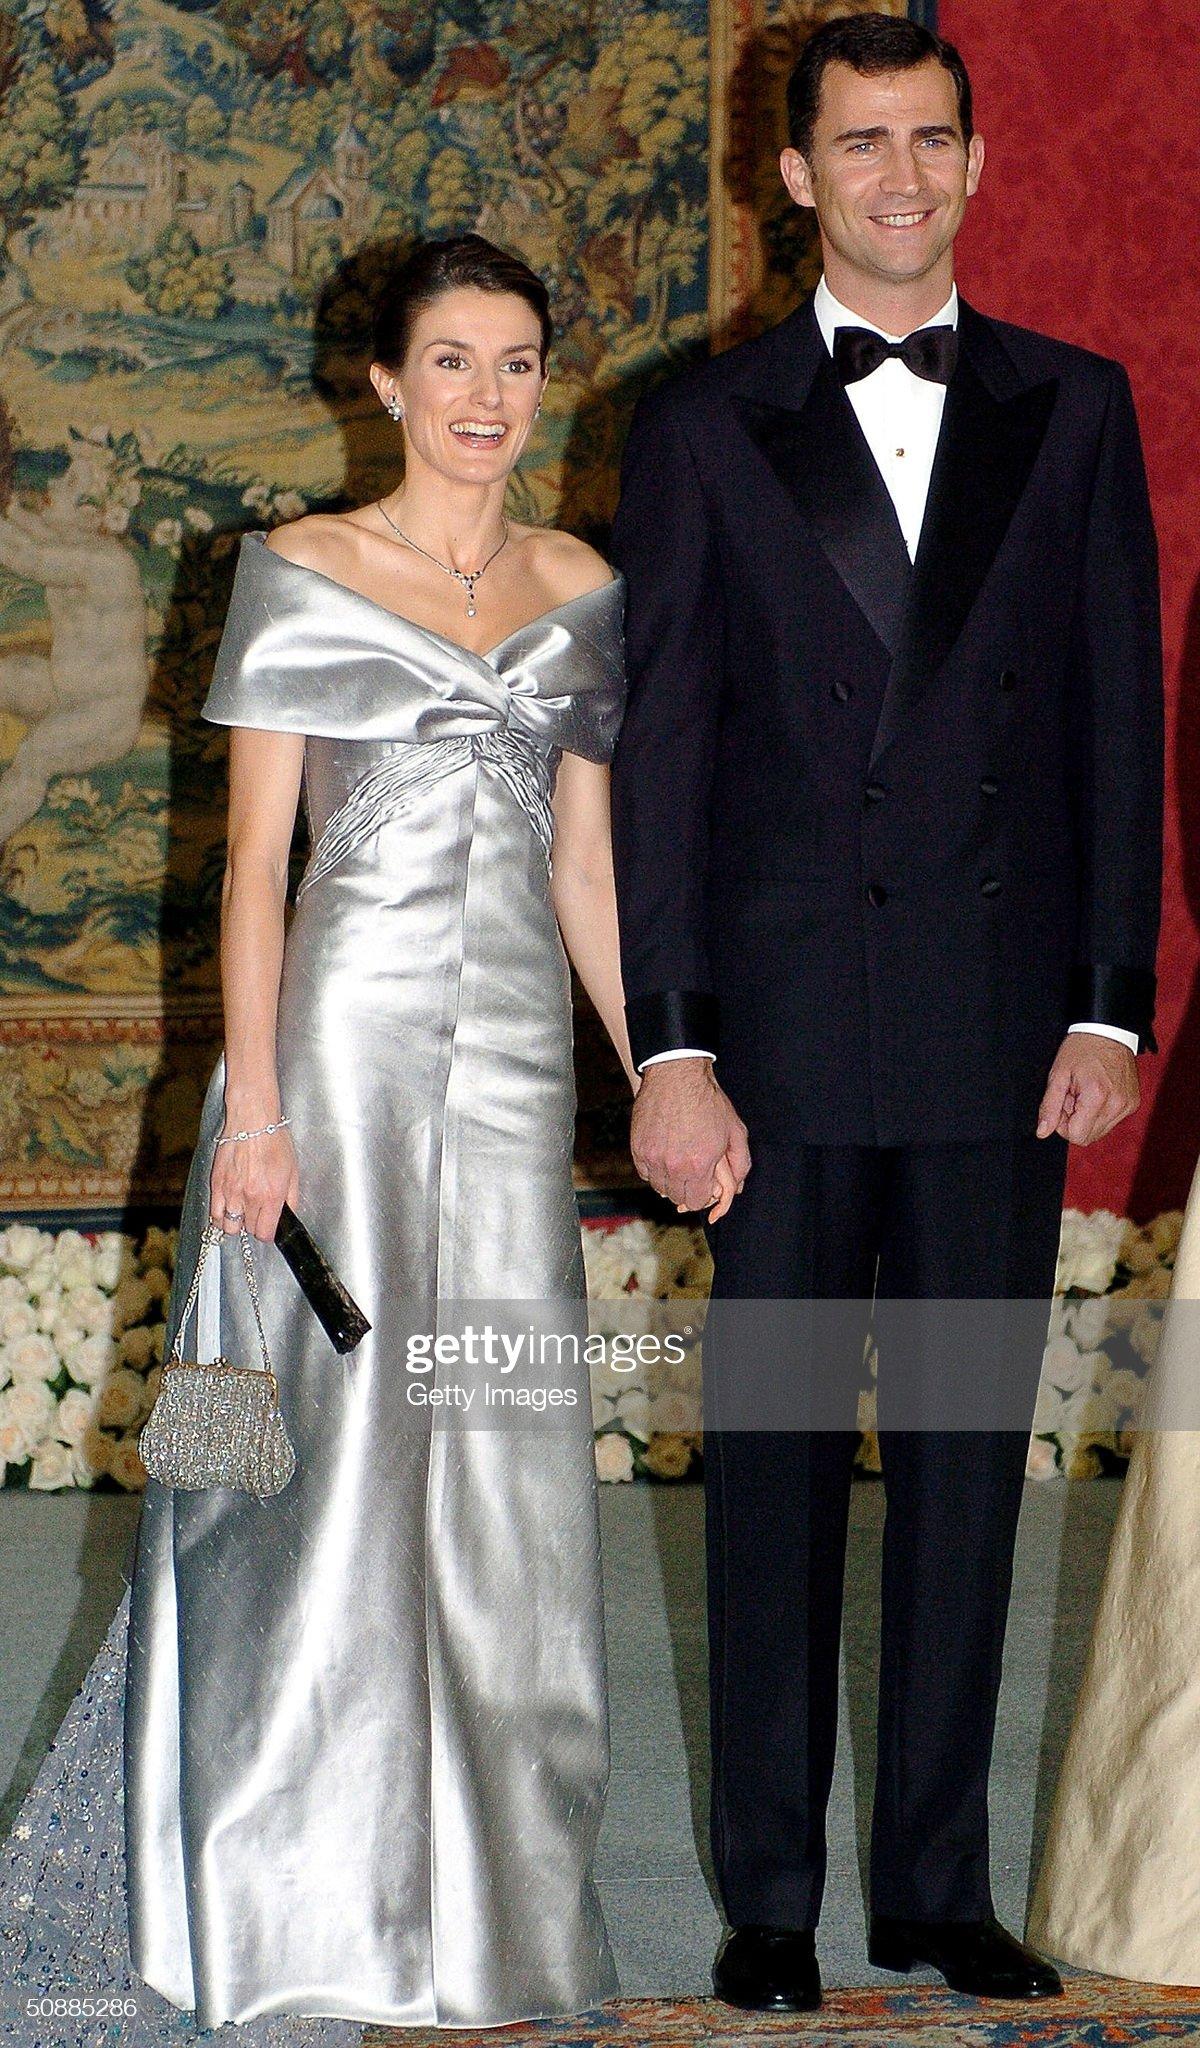 Вечерние наряды Королевы Летиции Gala Dinner at El Pardo Royal Palace In Preparation Spanish Wedding : News Photo